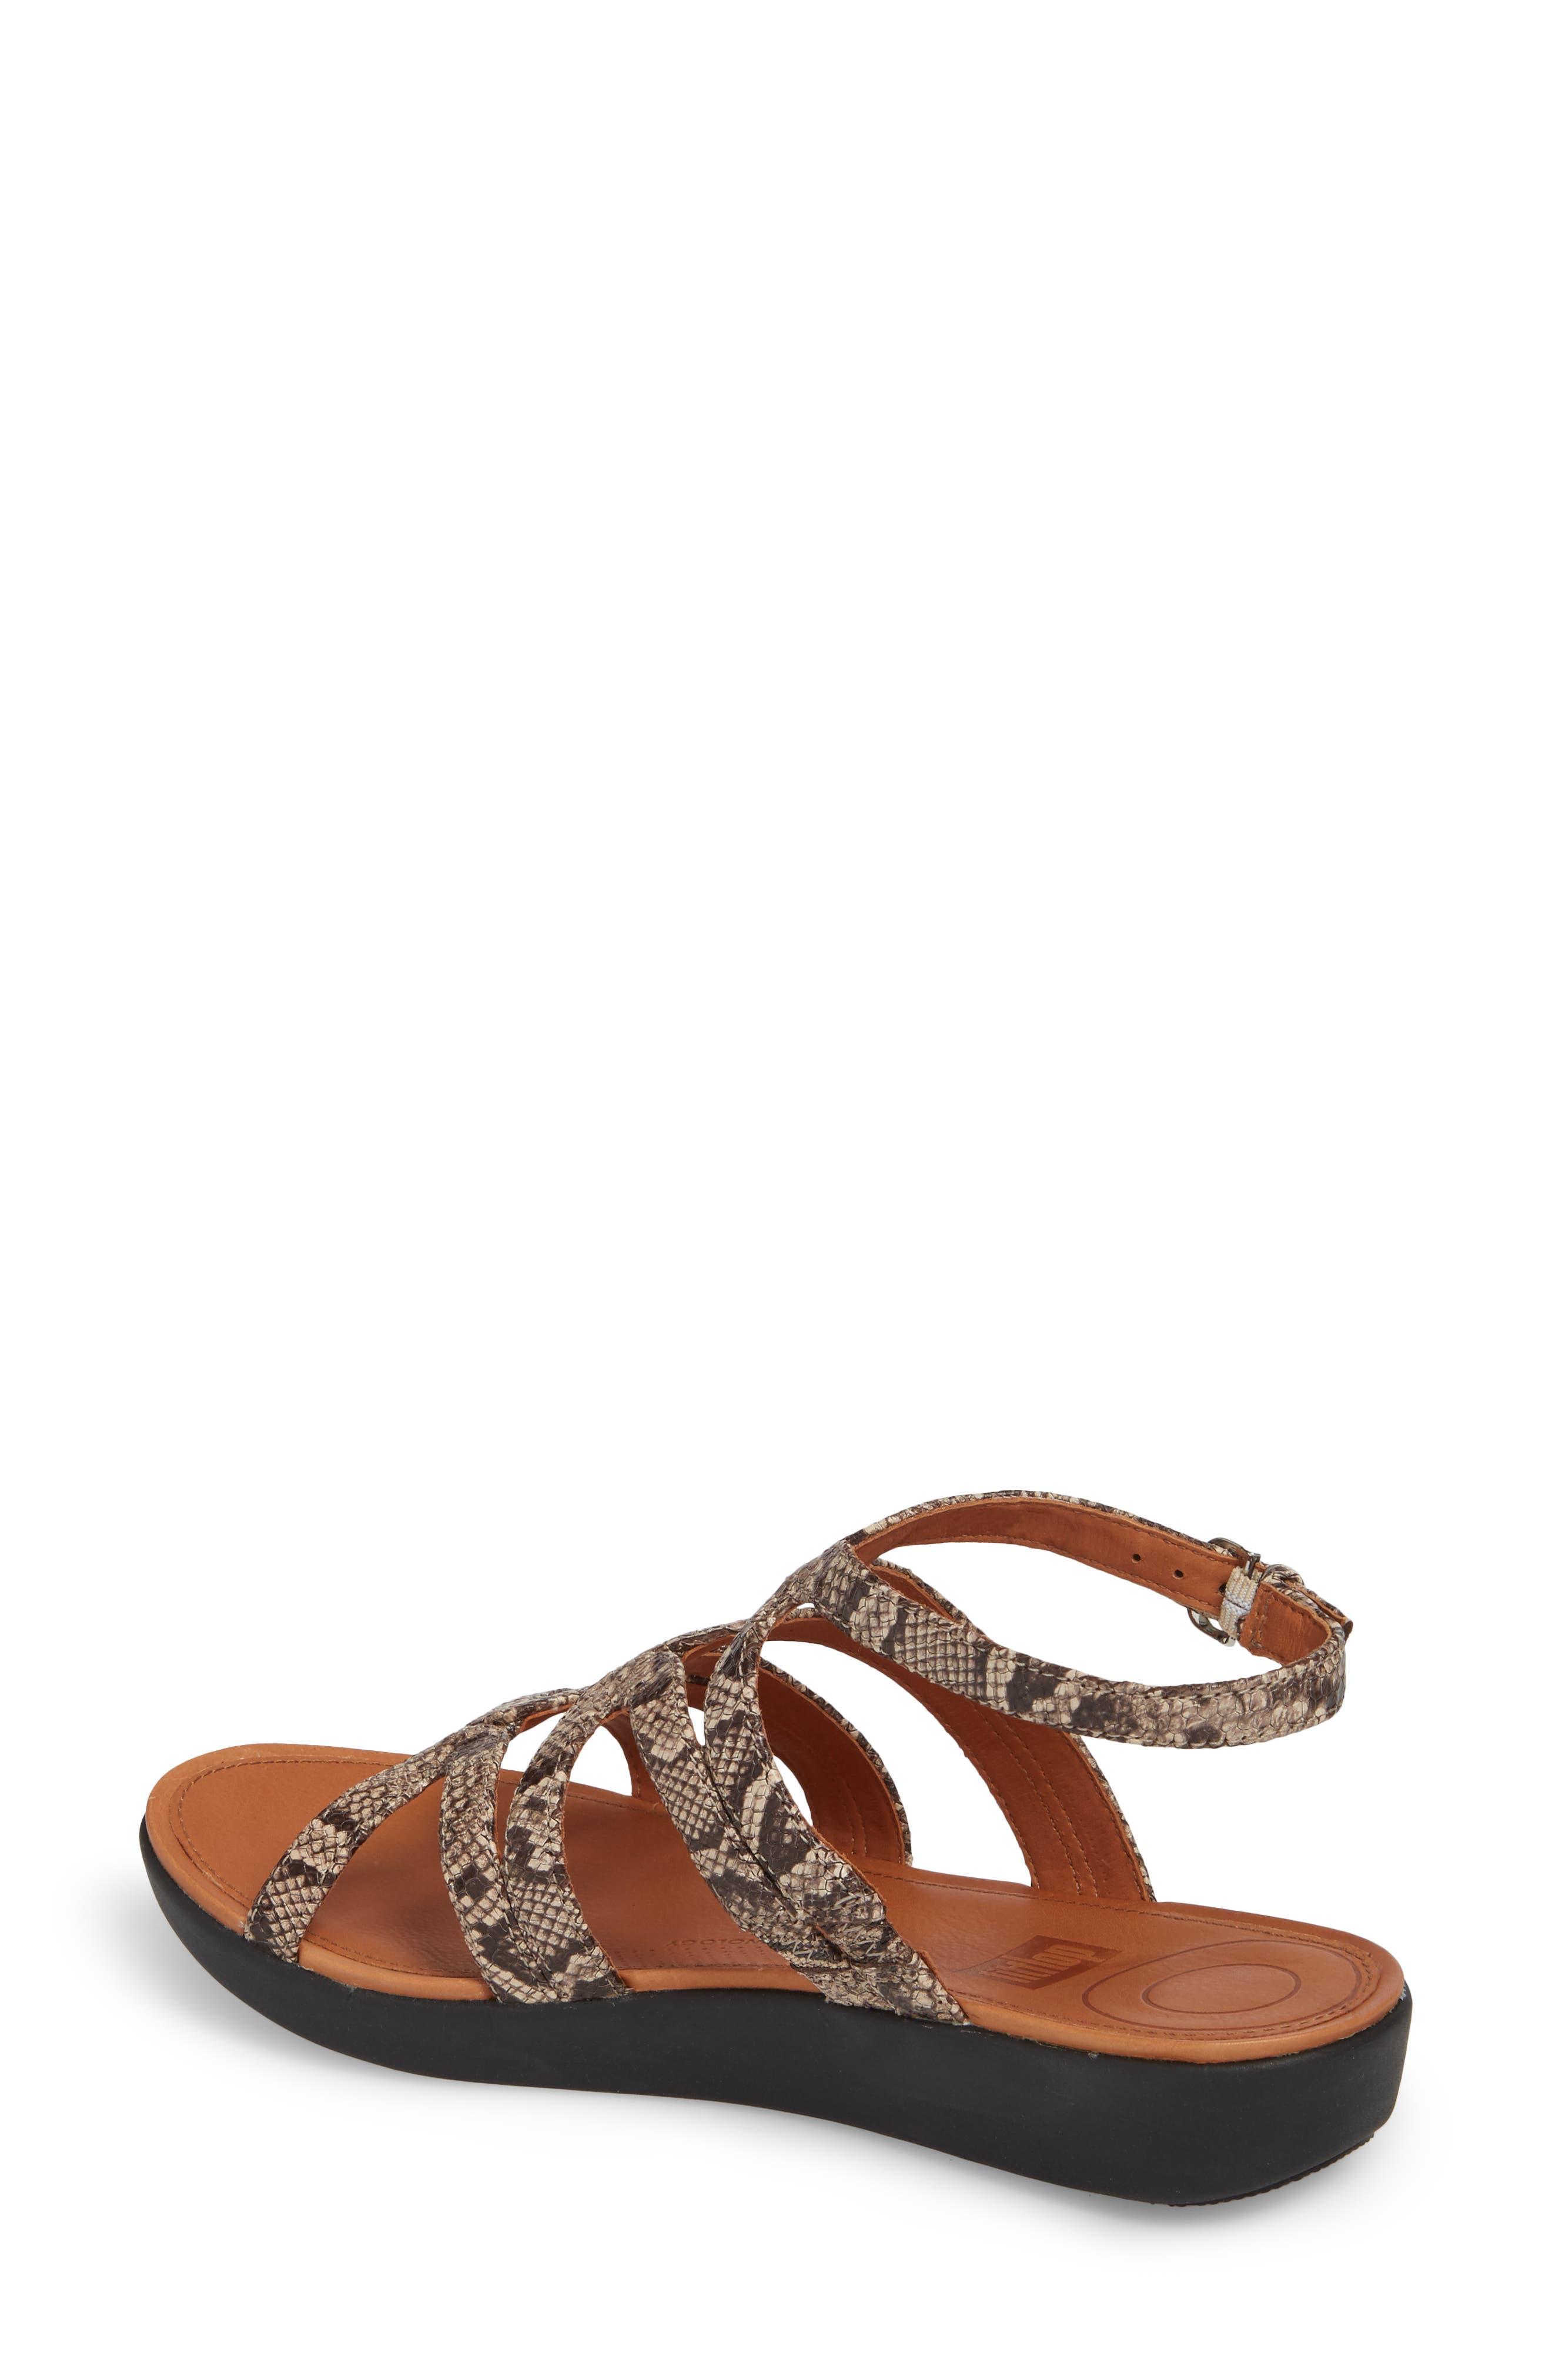 Strata Gladiator Sandal,                             Alternate thumbnail 2, color,                             Taupe Snake Print Leather